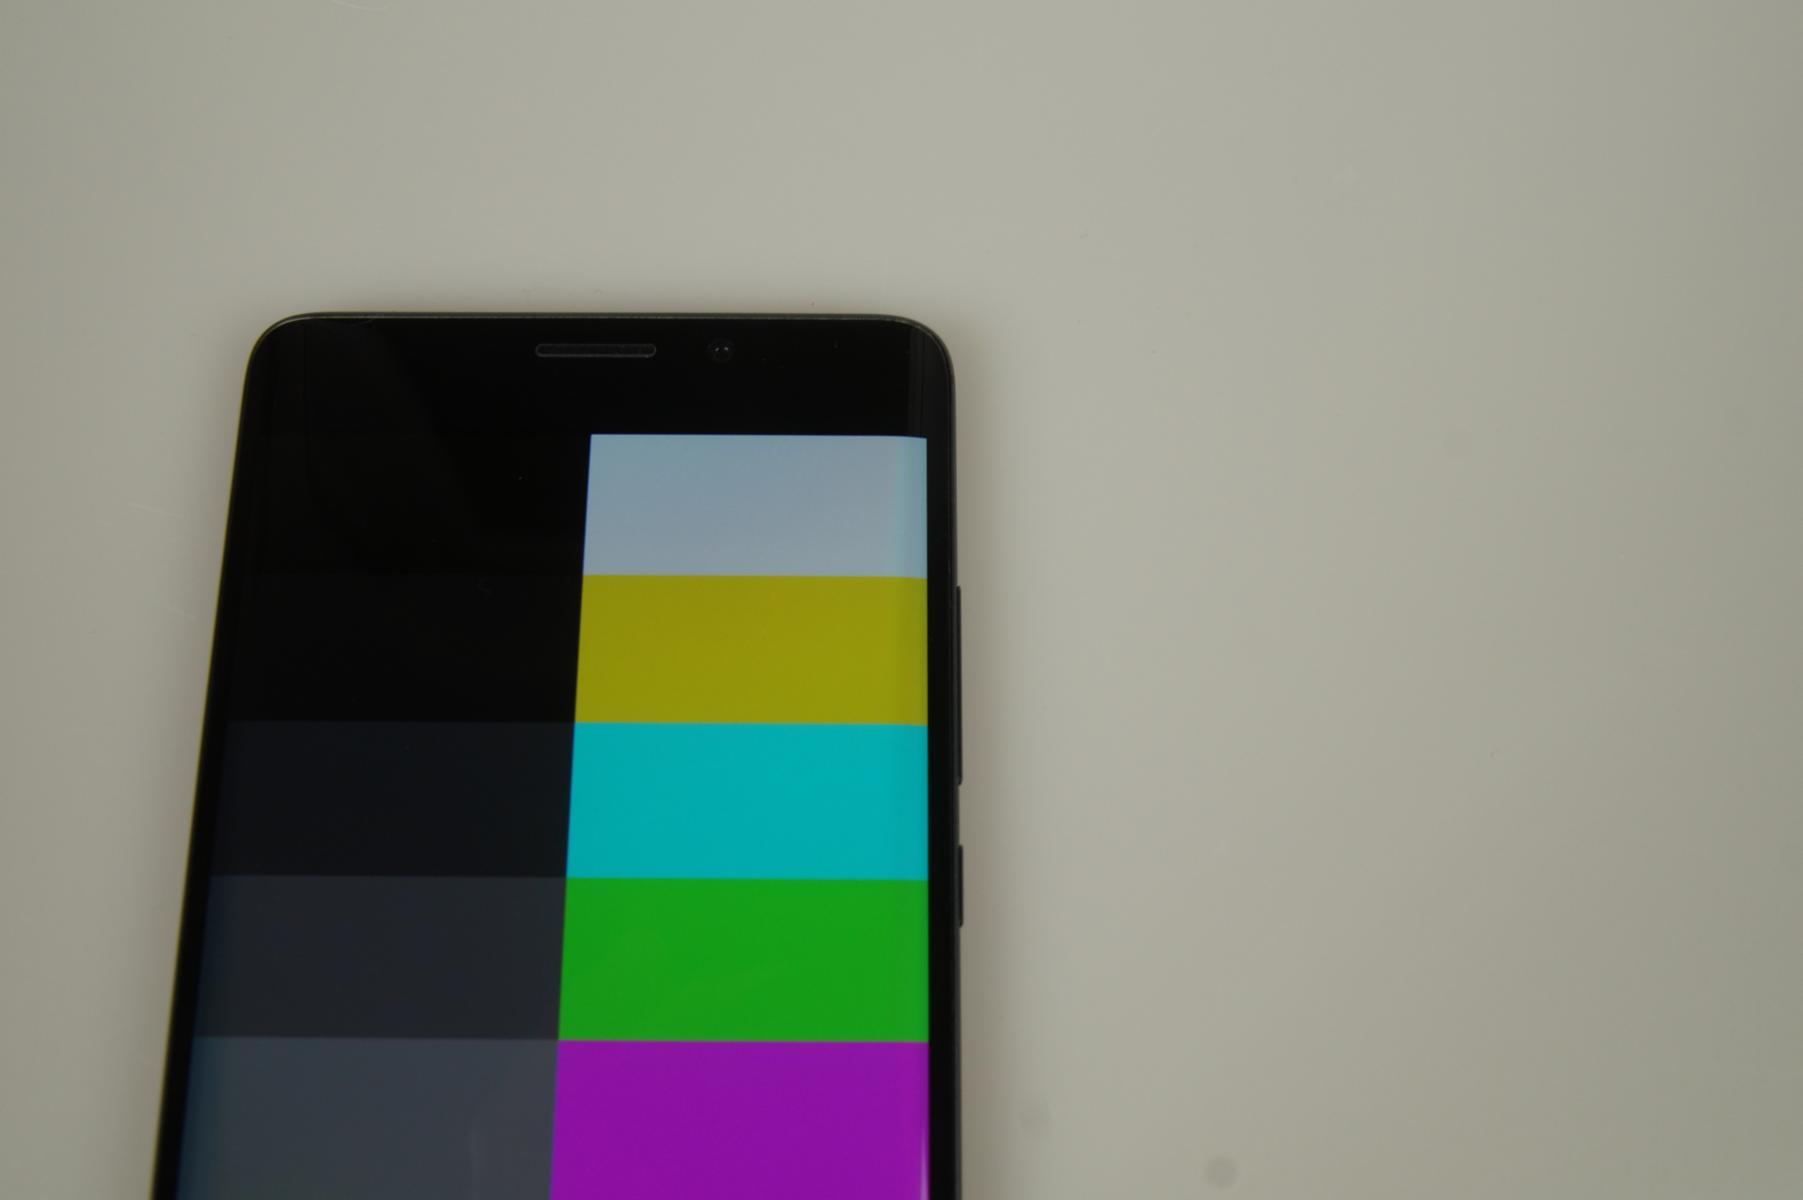 xiaomi-mi-note-2-curved-display-9